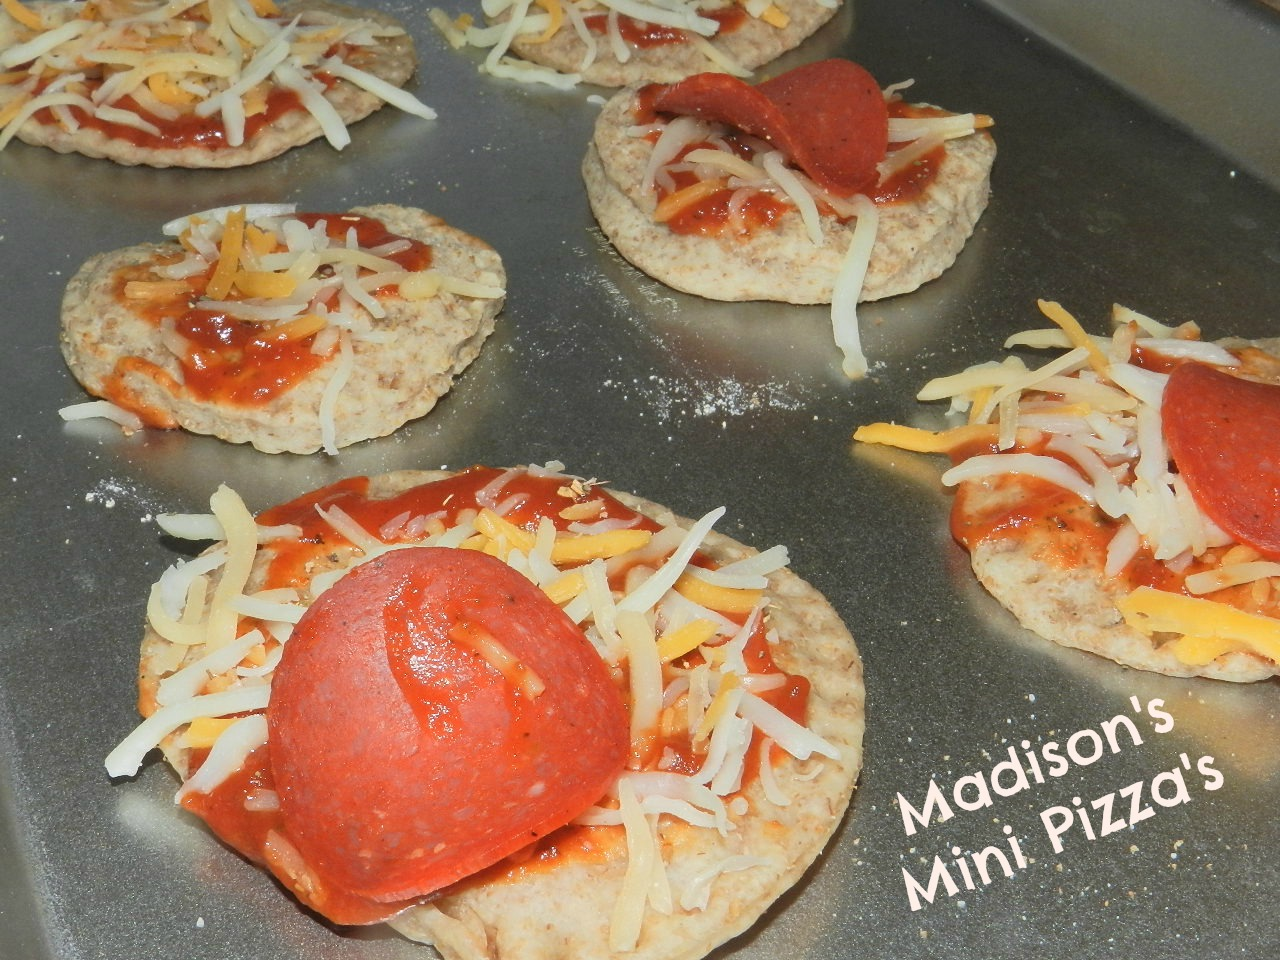 Madison's Mini Pizza's